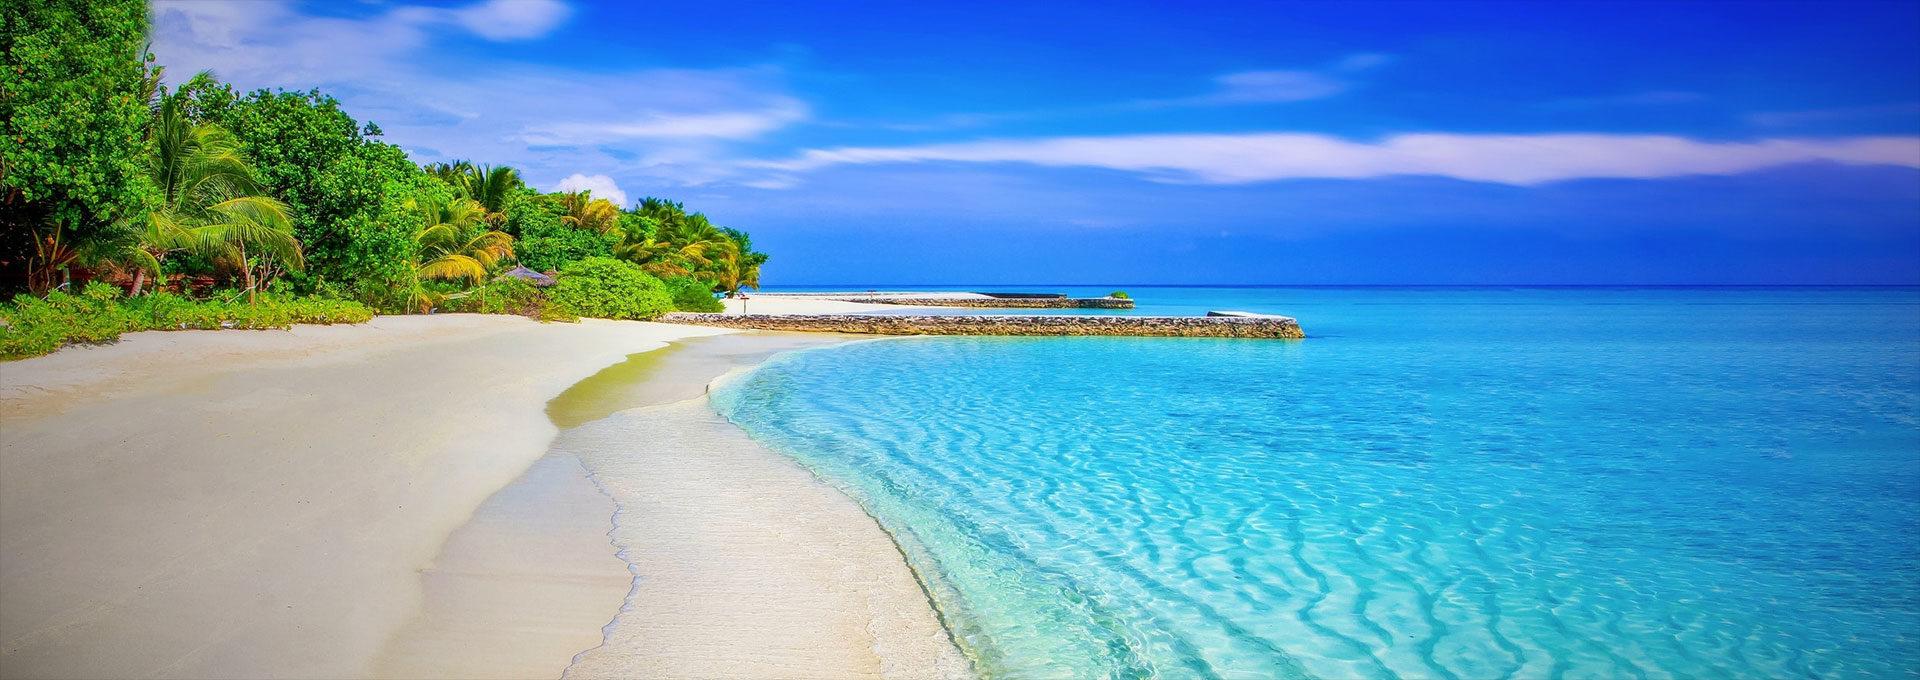 Travel Tour Philippines